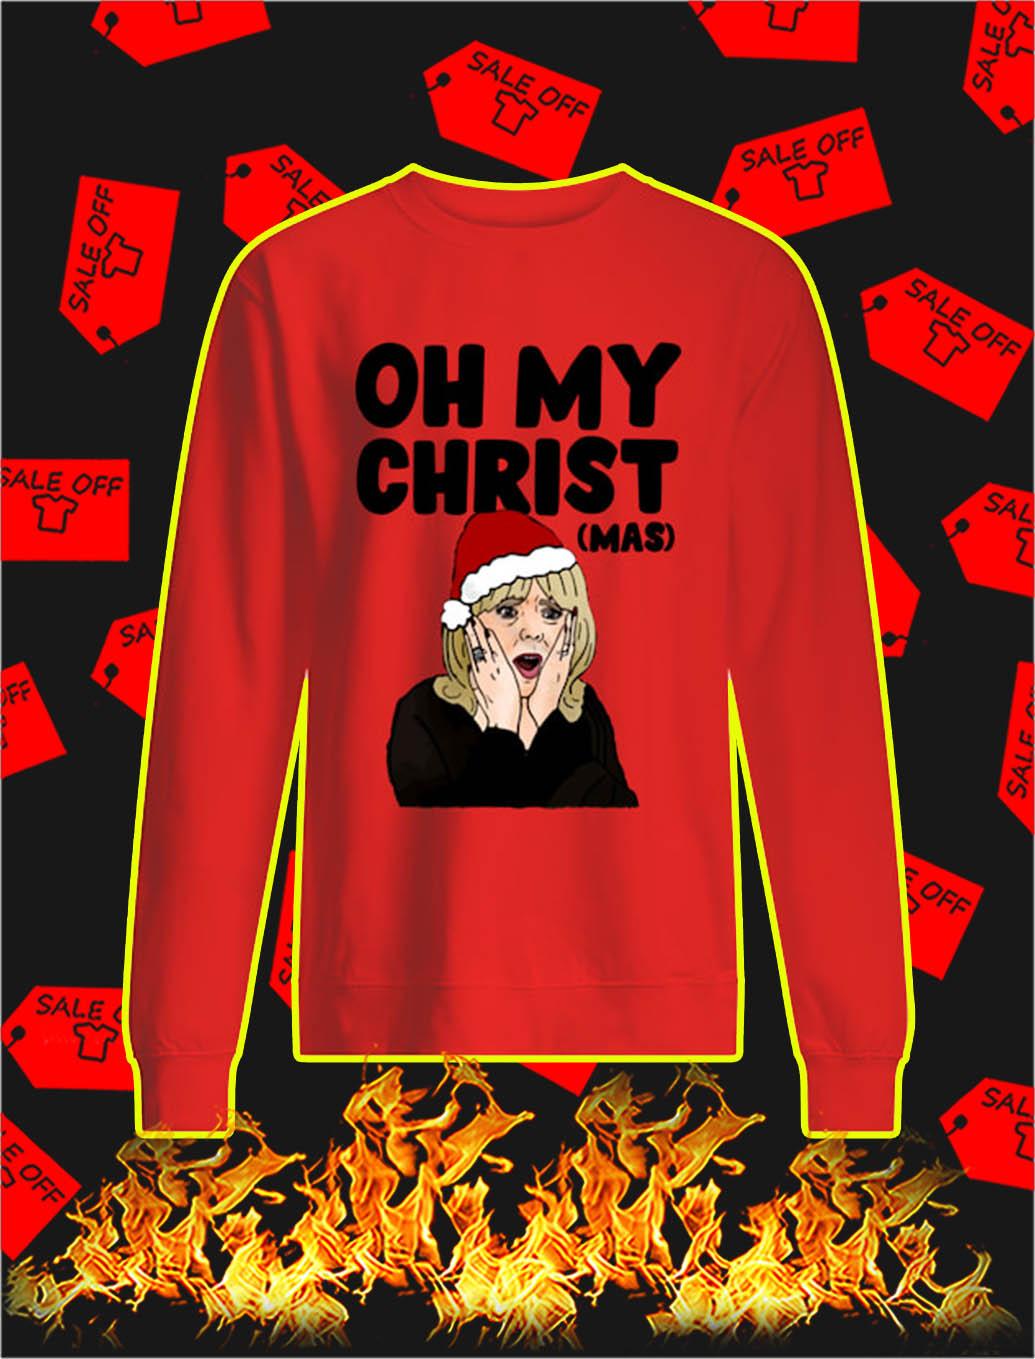 Oh My Christ Christmas sweatshirt